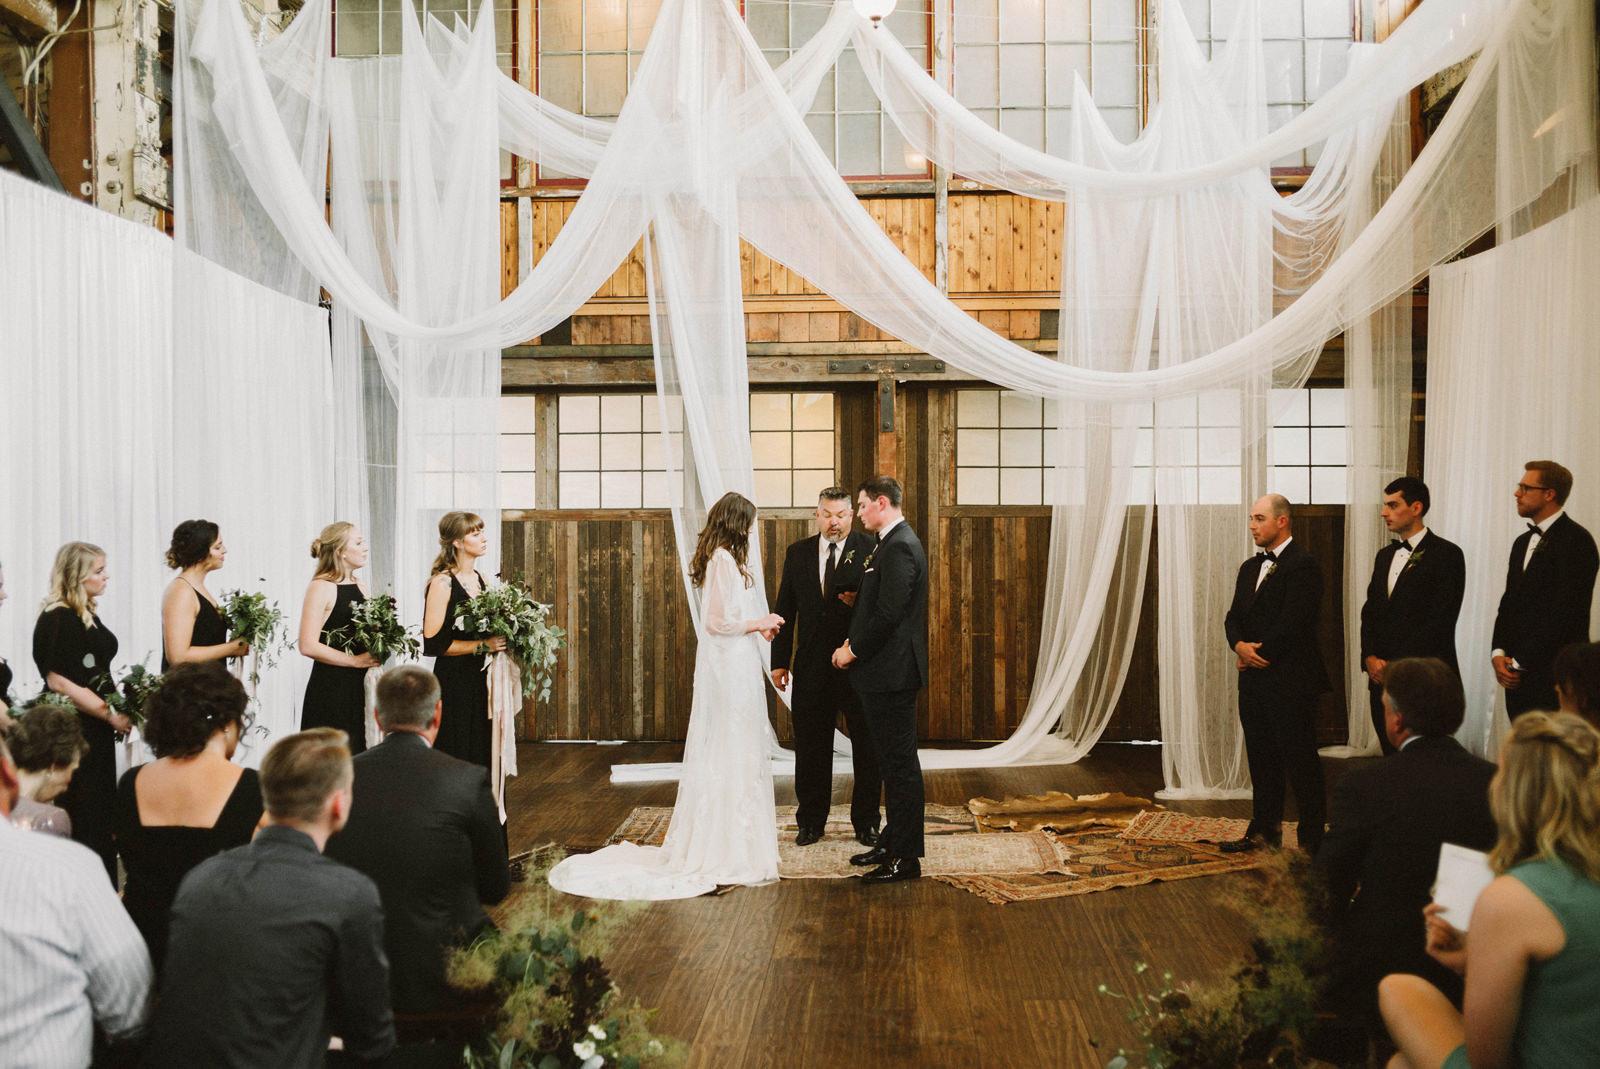 sodo-park-wedding-044 SODO PARK WEDDING